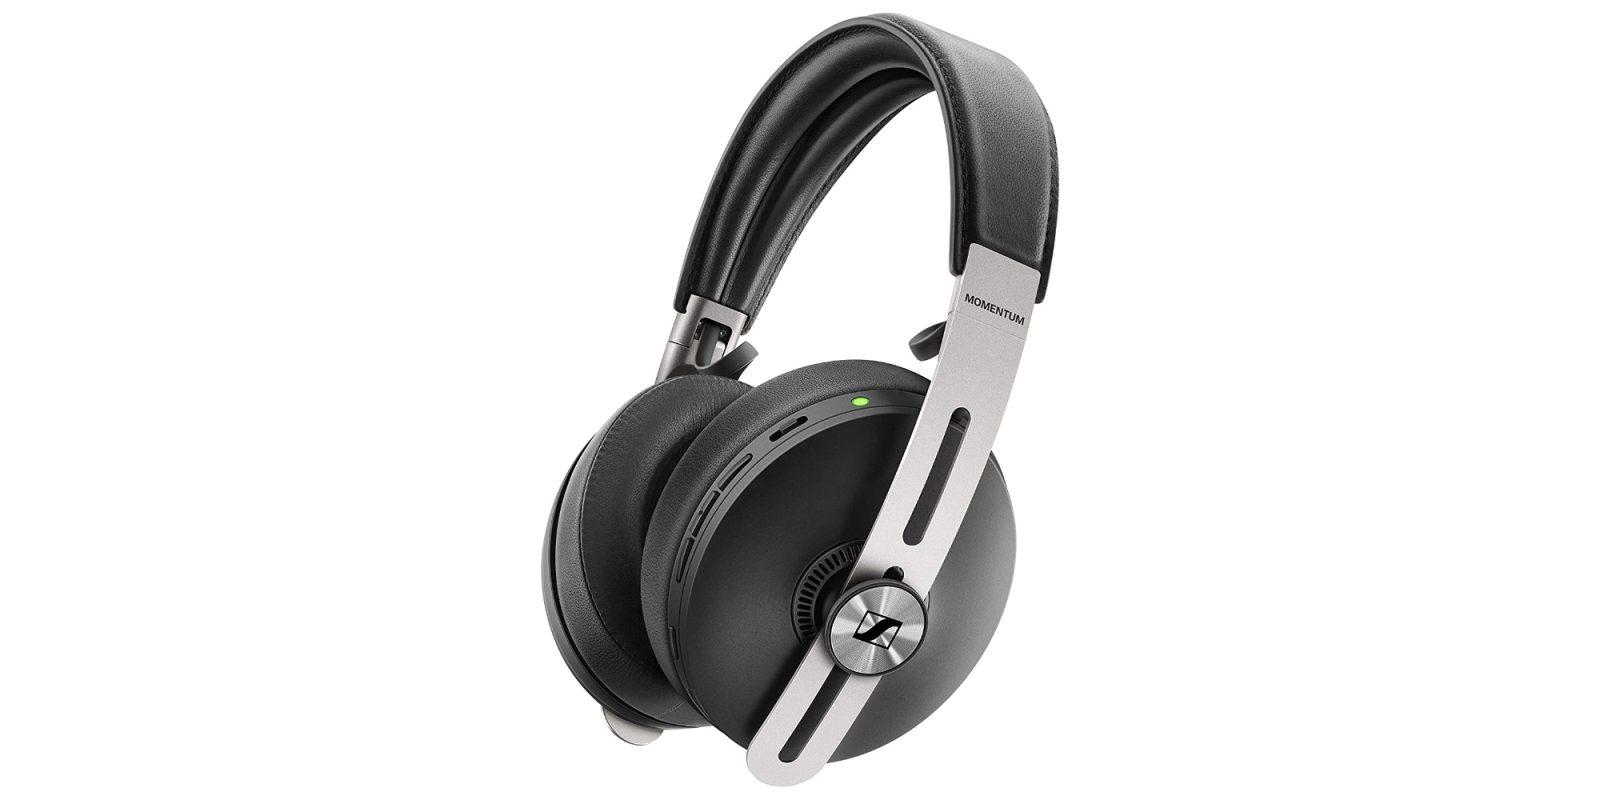 Sennheiser's latest Momentum 3 ANC Headphones hit new low of $331 (Reg. $400)